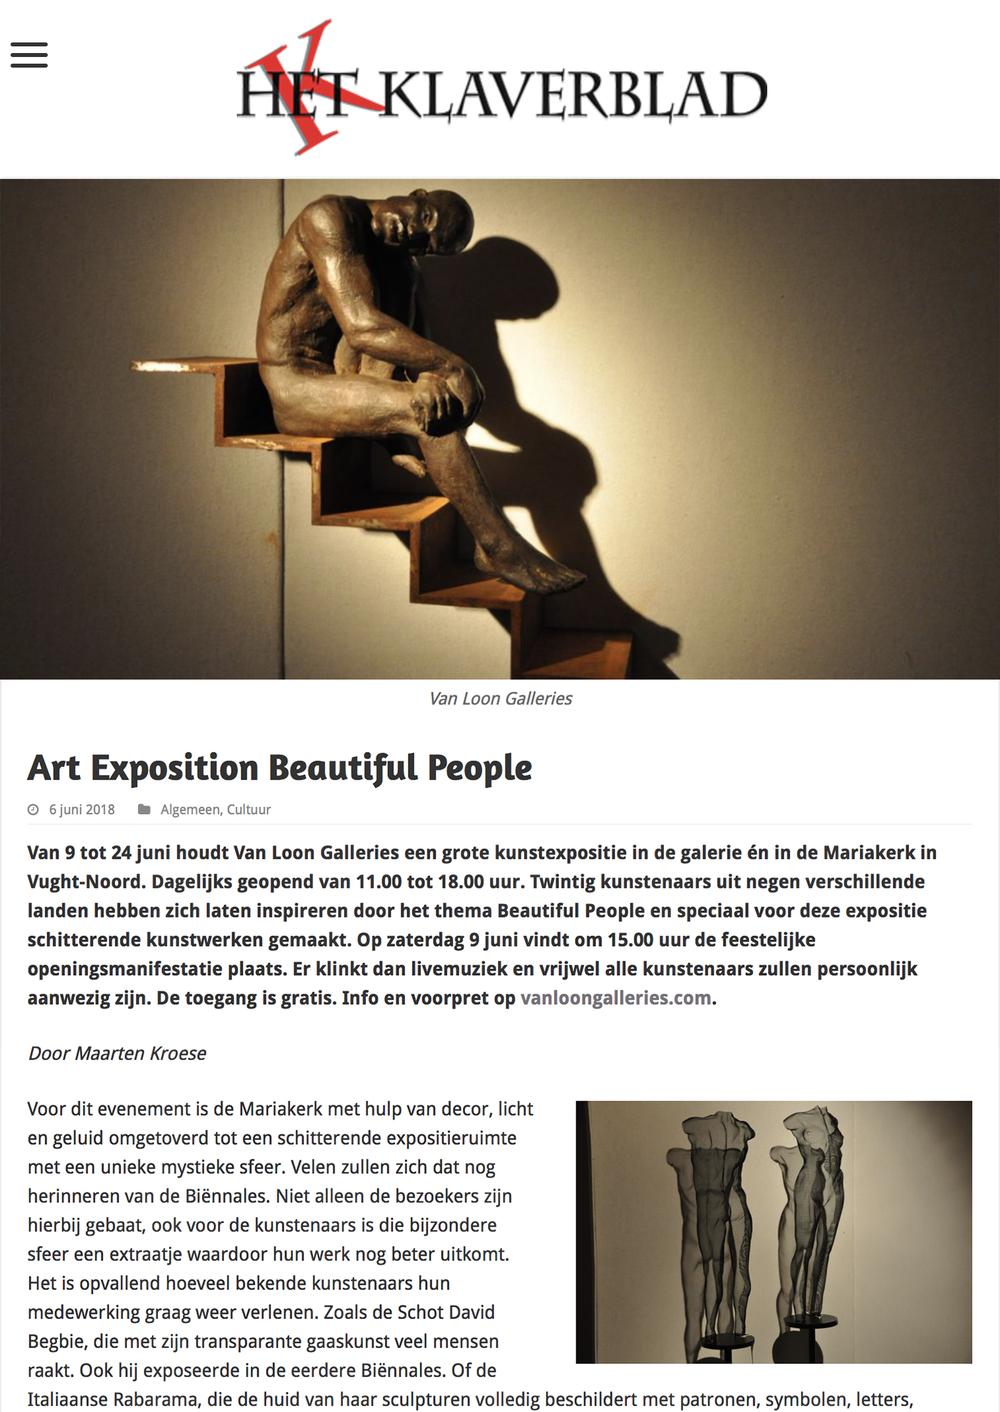 Art Exposition Beautiful People